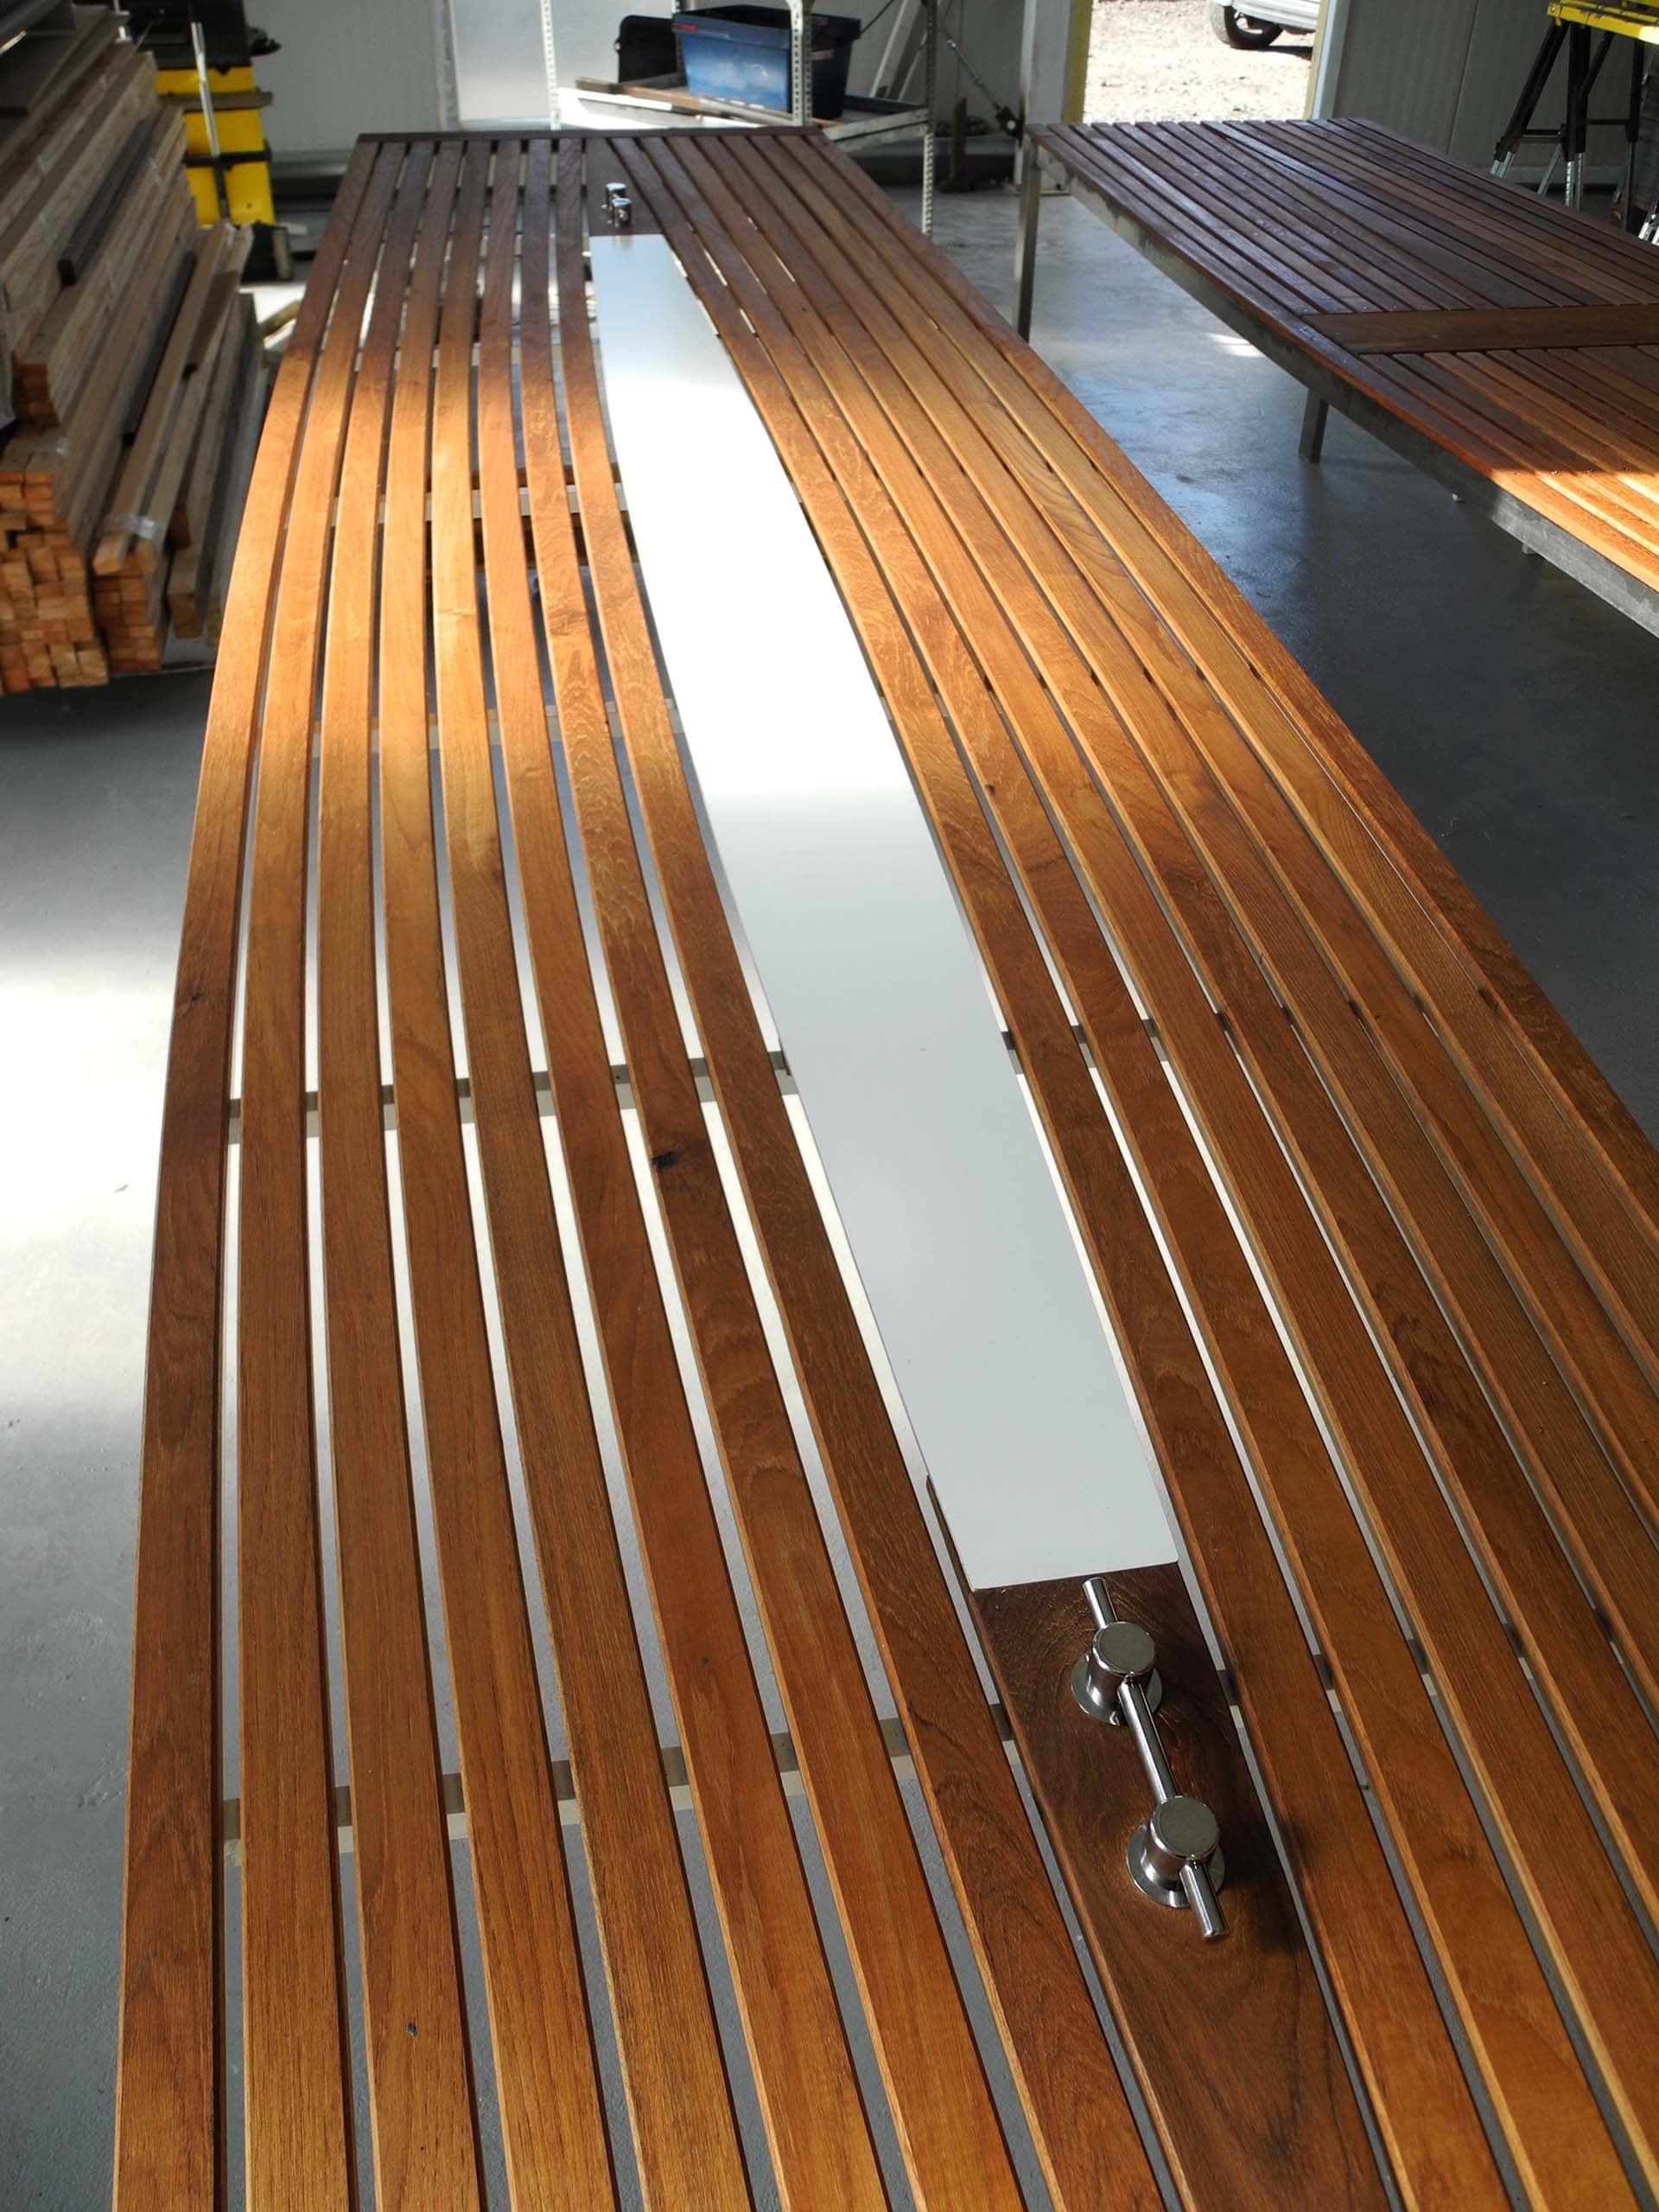 Design Tisch Sealine Nummer 6 aus Teak-Holz Metall Edelstahl by Sebastian Bohry